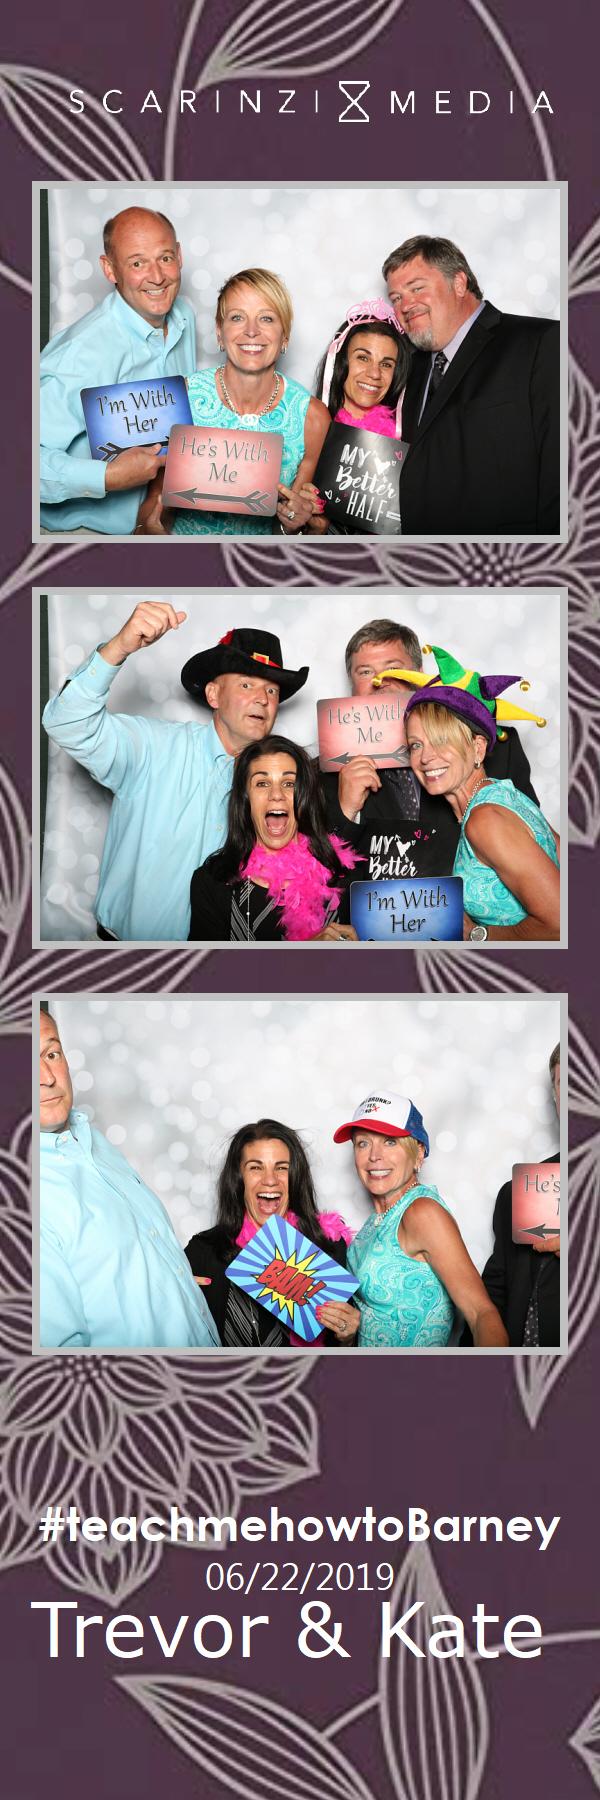 2019.06.22 - Barney Wedding PHOTOBOOTH43.jpg